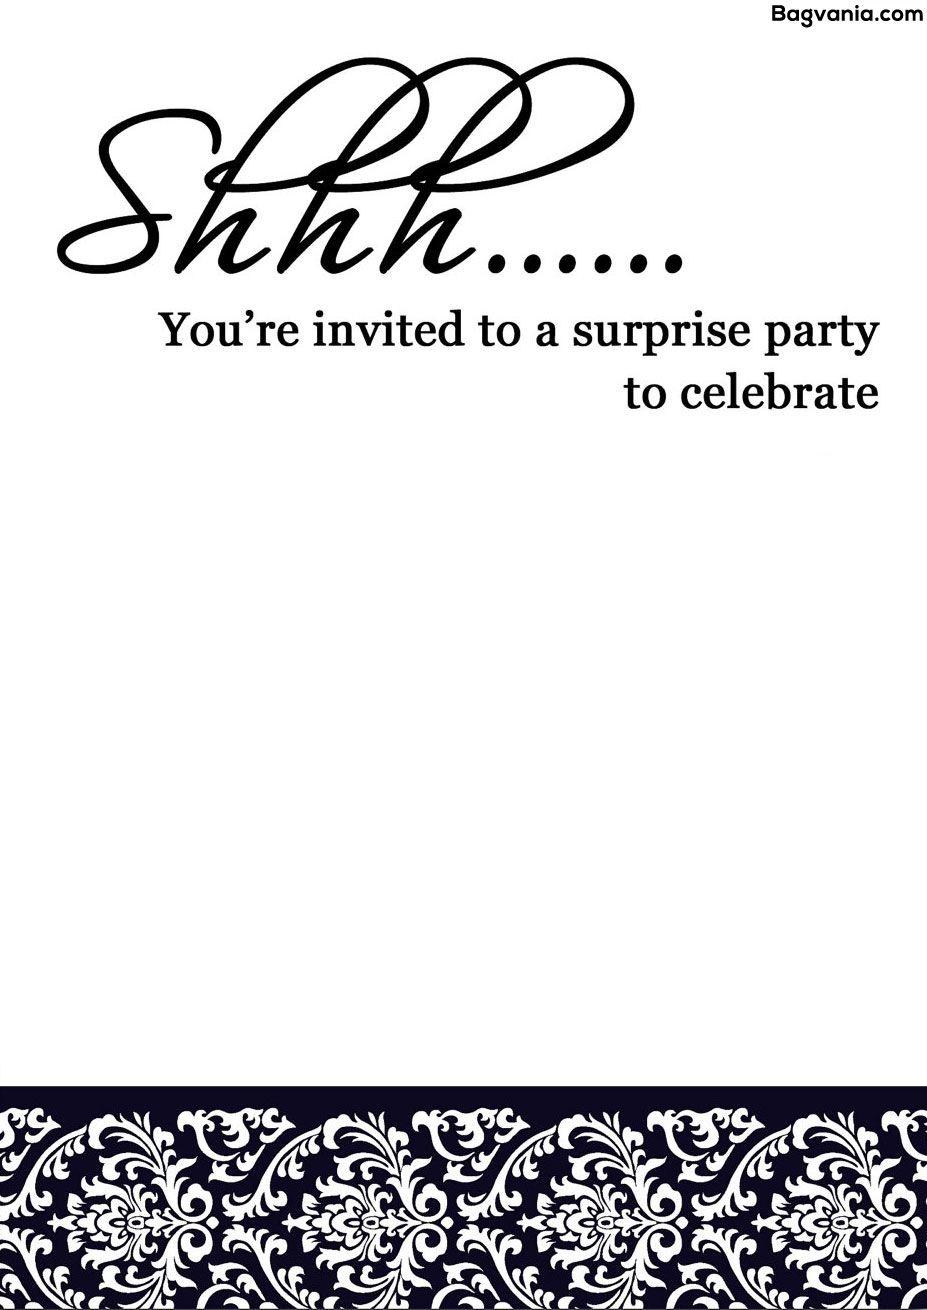 Free Printable Surprise Birthday Invitations – Bagvania Free - Free Printable Surprise Party Invitations